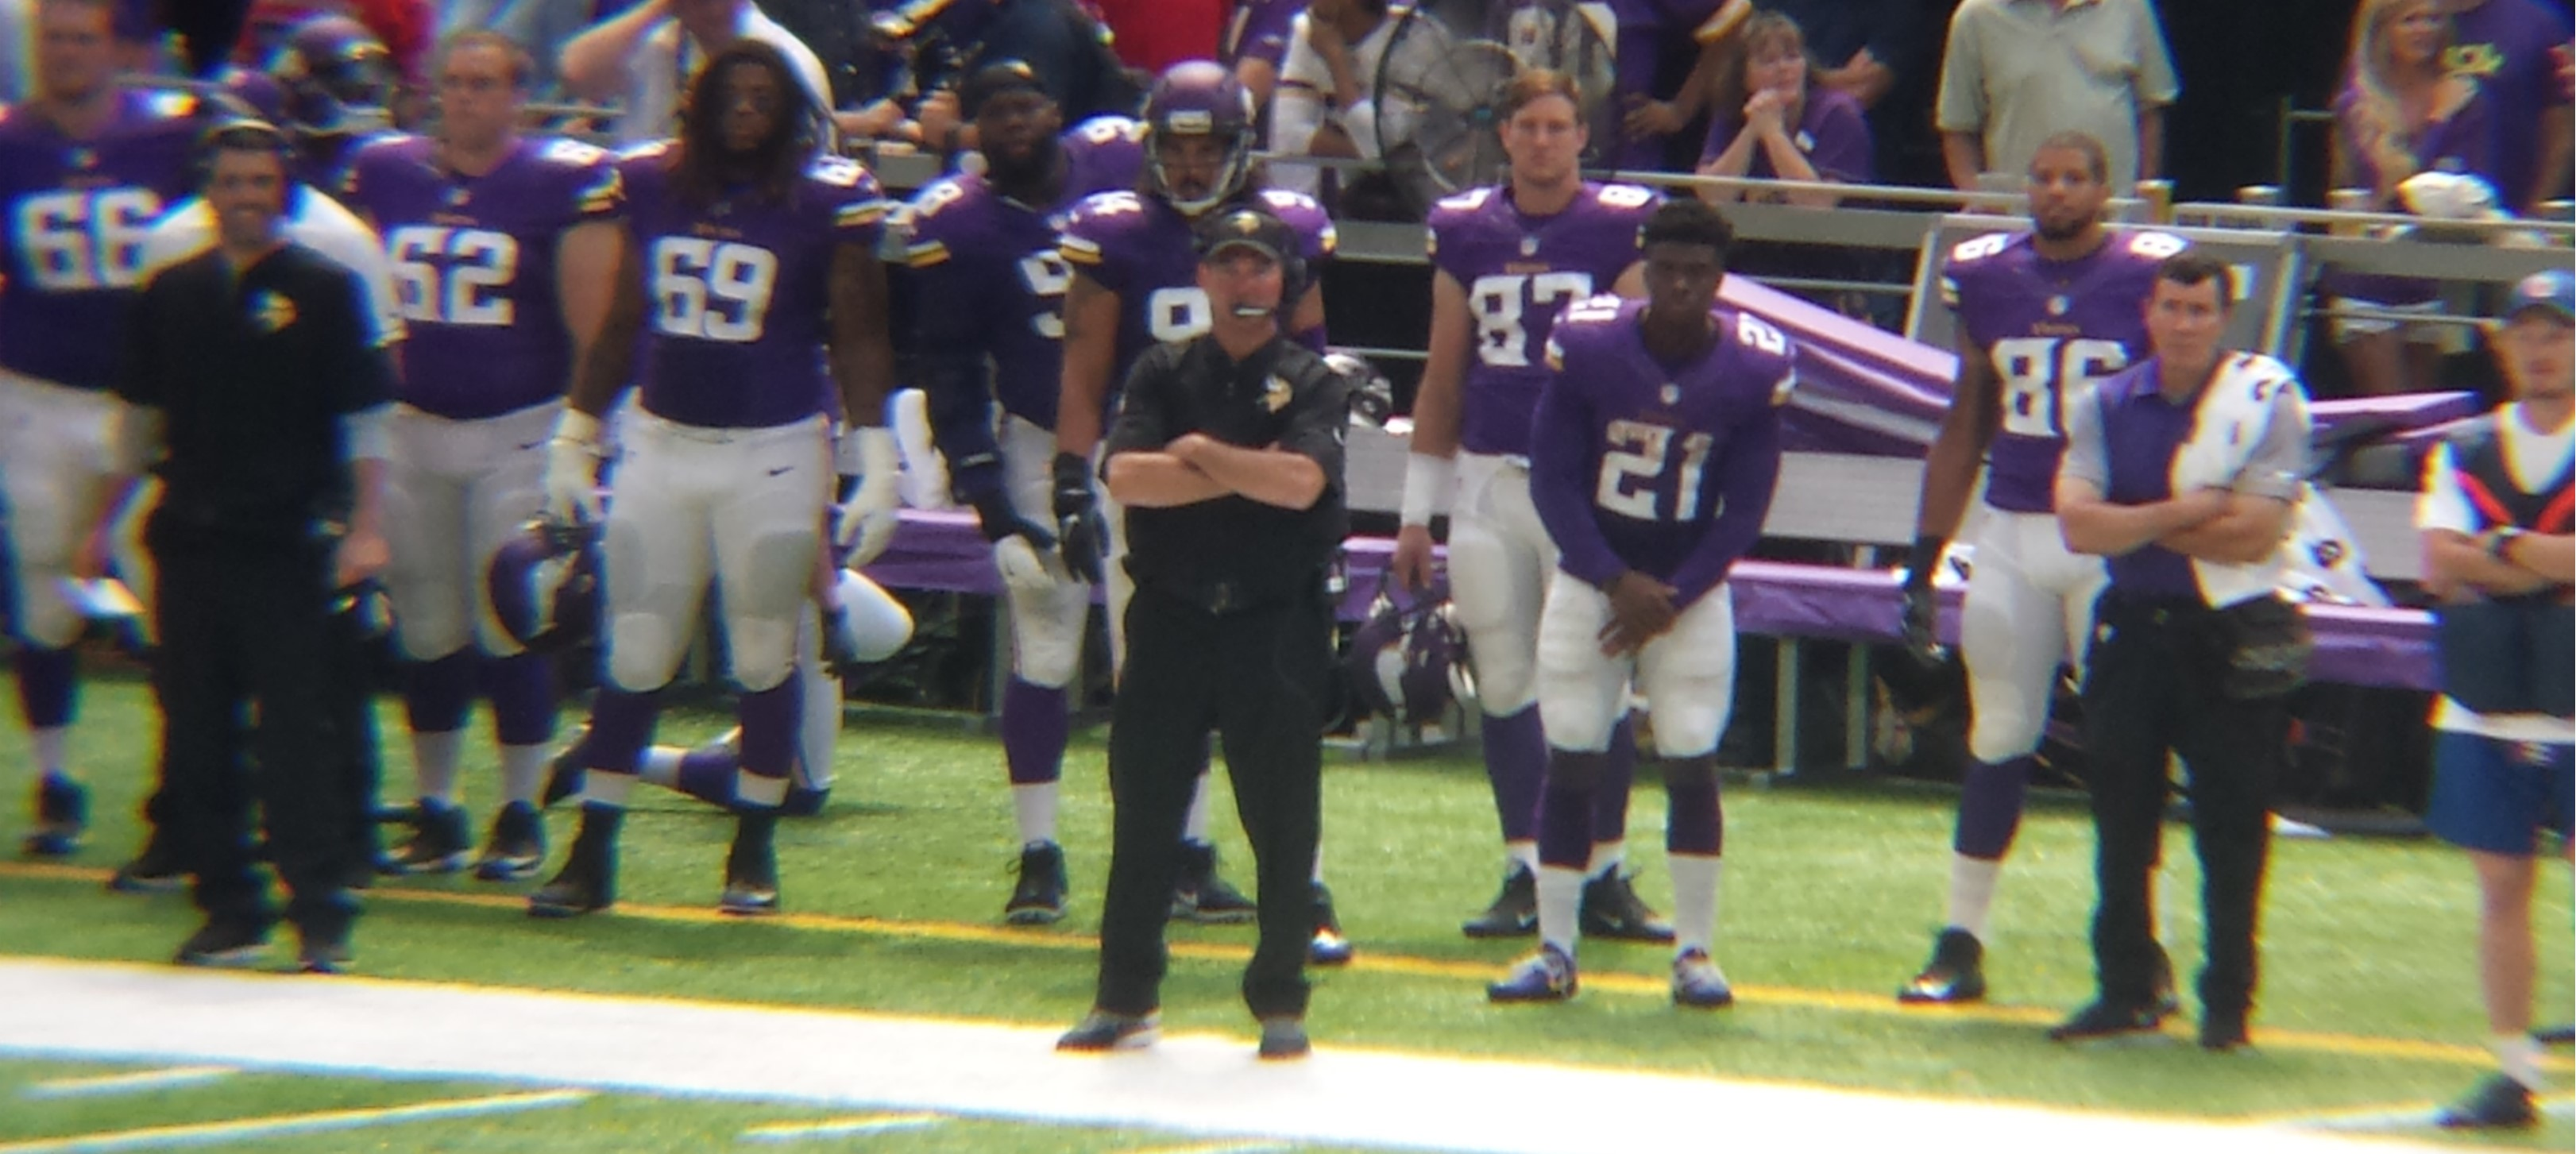 Minnesota Vikings U.S. Bank Stadium First Game - Coach Mike Zimmer